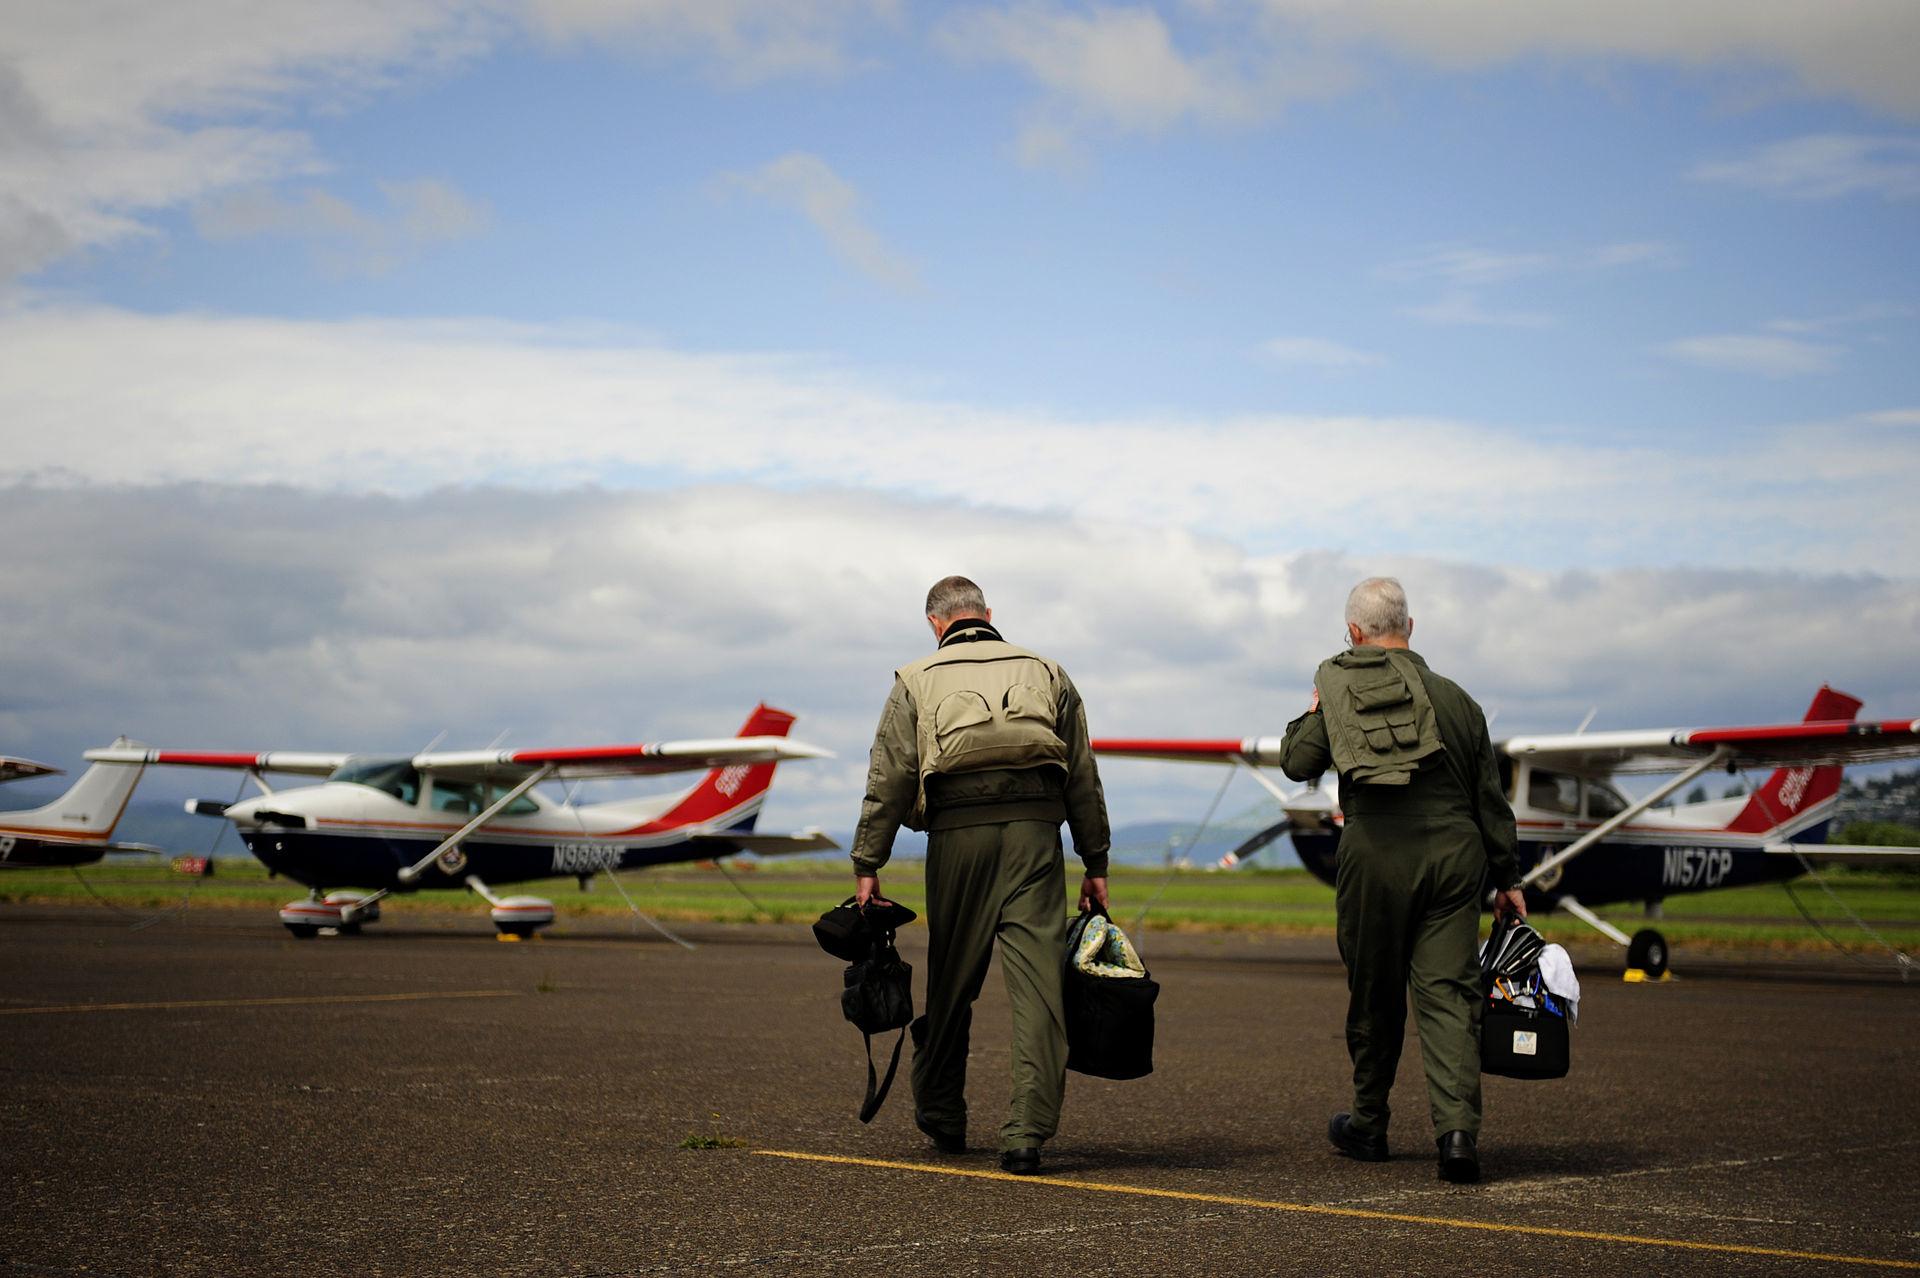 Civil_Air_Patrol_pilots_during_Amalgam_Dart_2009.jpg